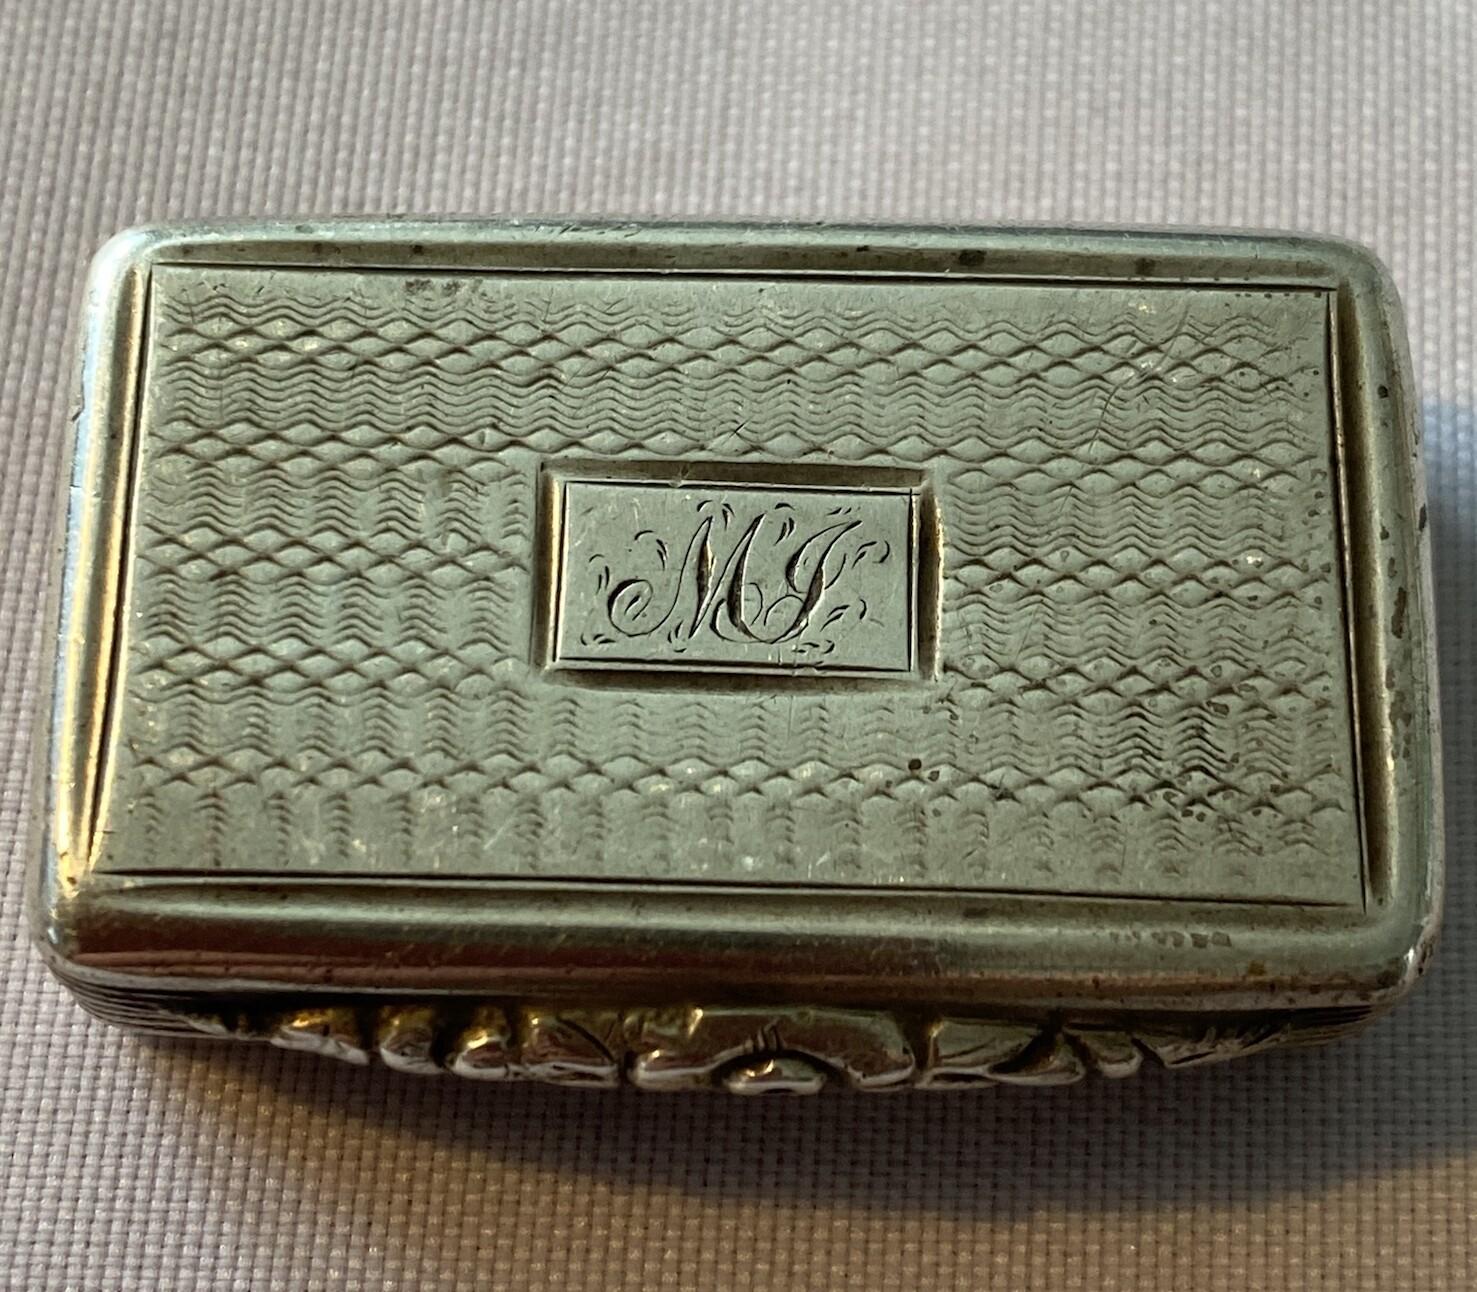 Georgian Silver Pill Box - 1831 Hallmark